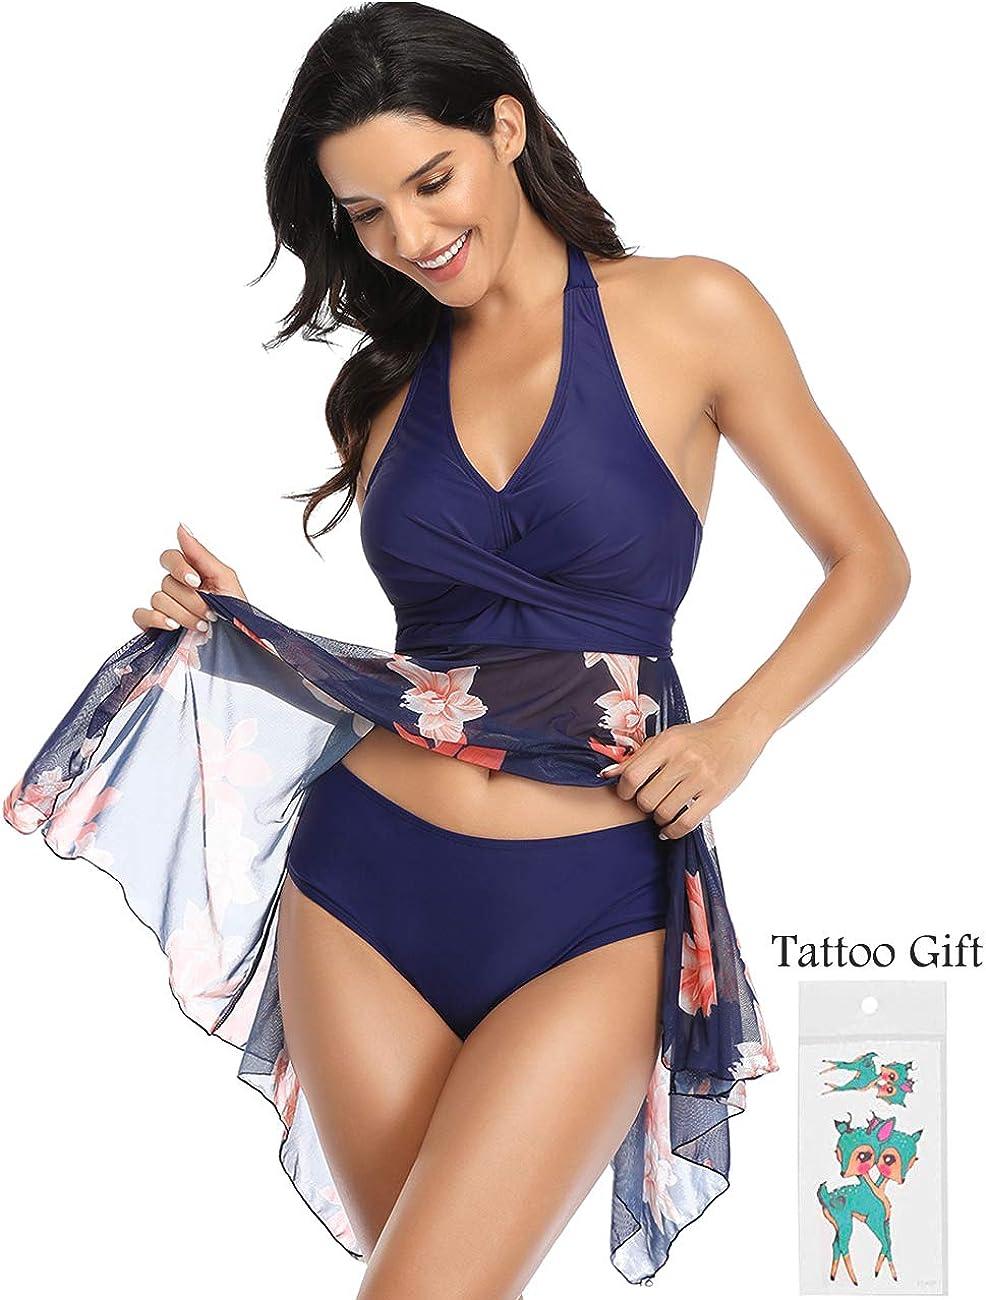 Donne Costume da Bagno Tankini Gonna Bikini Set Beachwear Push Up Halter Swimsuit da Mare Spiaggia Piscina